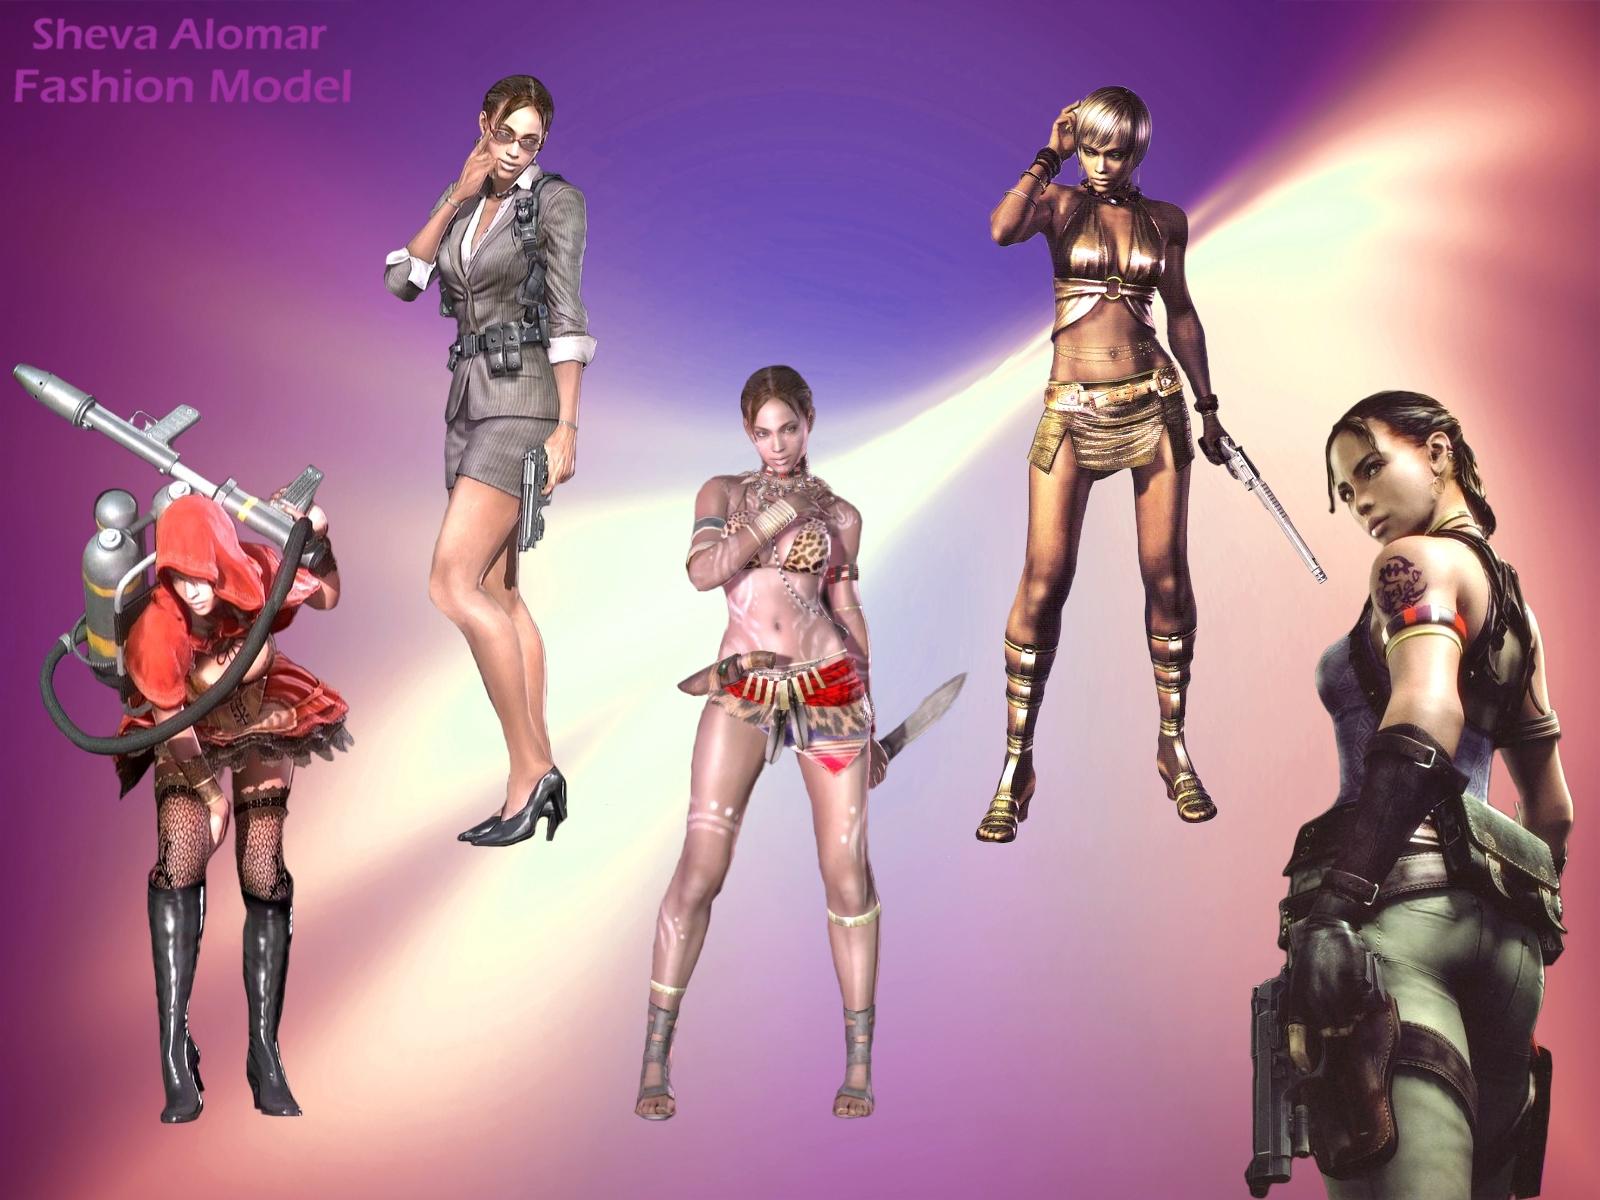 http://2.bp.blogspot.com/-2nEaMNdvaa0/TinYbzhTibI/AAAAAAAAASs/ekmDpWae6Gg/s1600/Sheva_Alomar_Fashion_Model_by_GamewowsFanboy.jpg